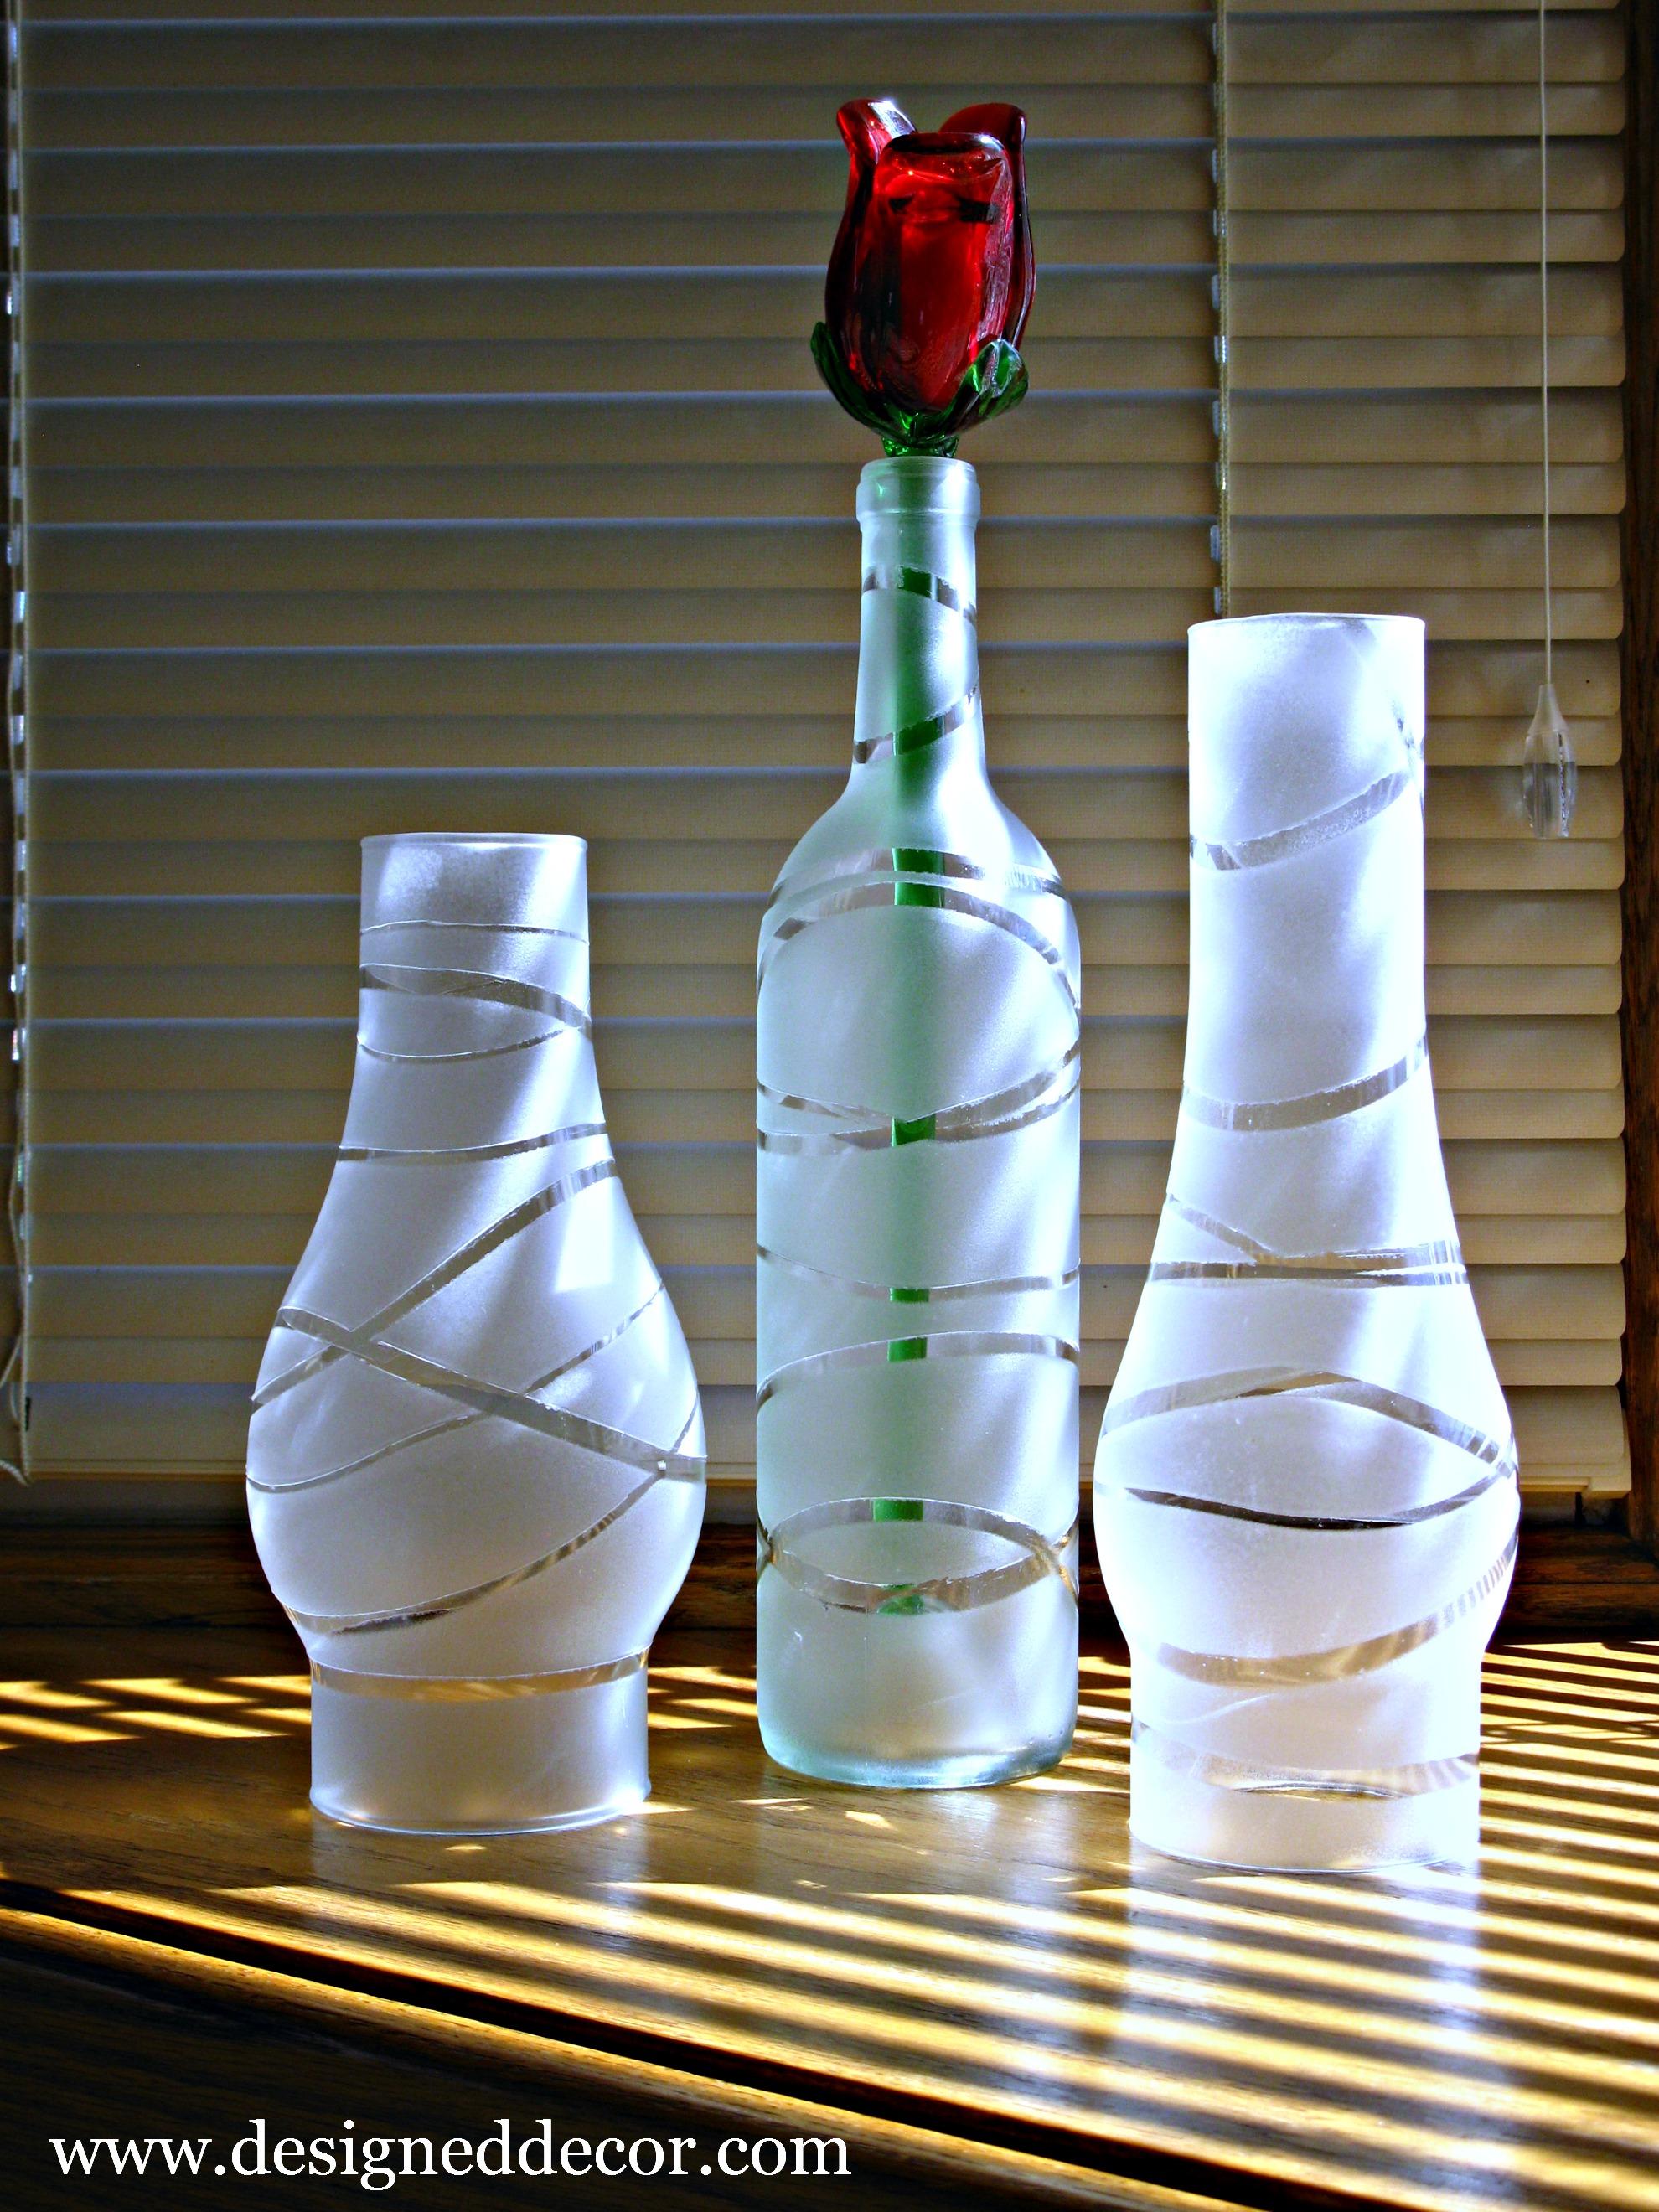 Diy painted jars and bottles designed decor for Diy crafts with glass jars and bottles